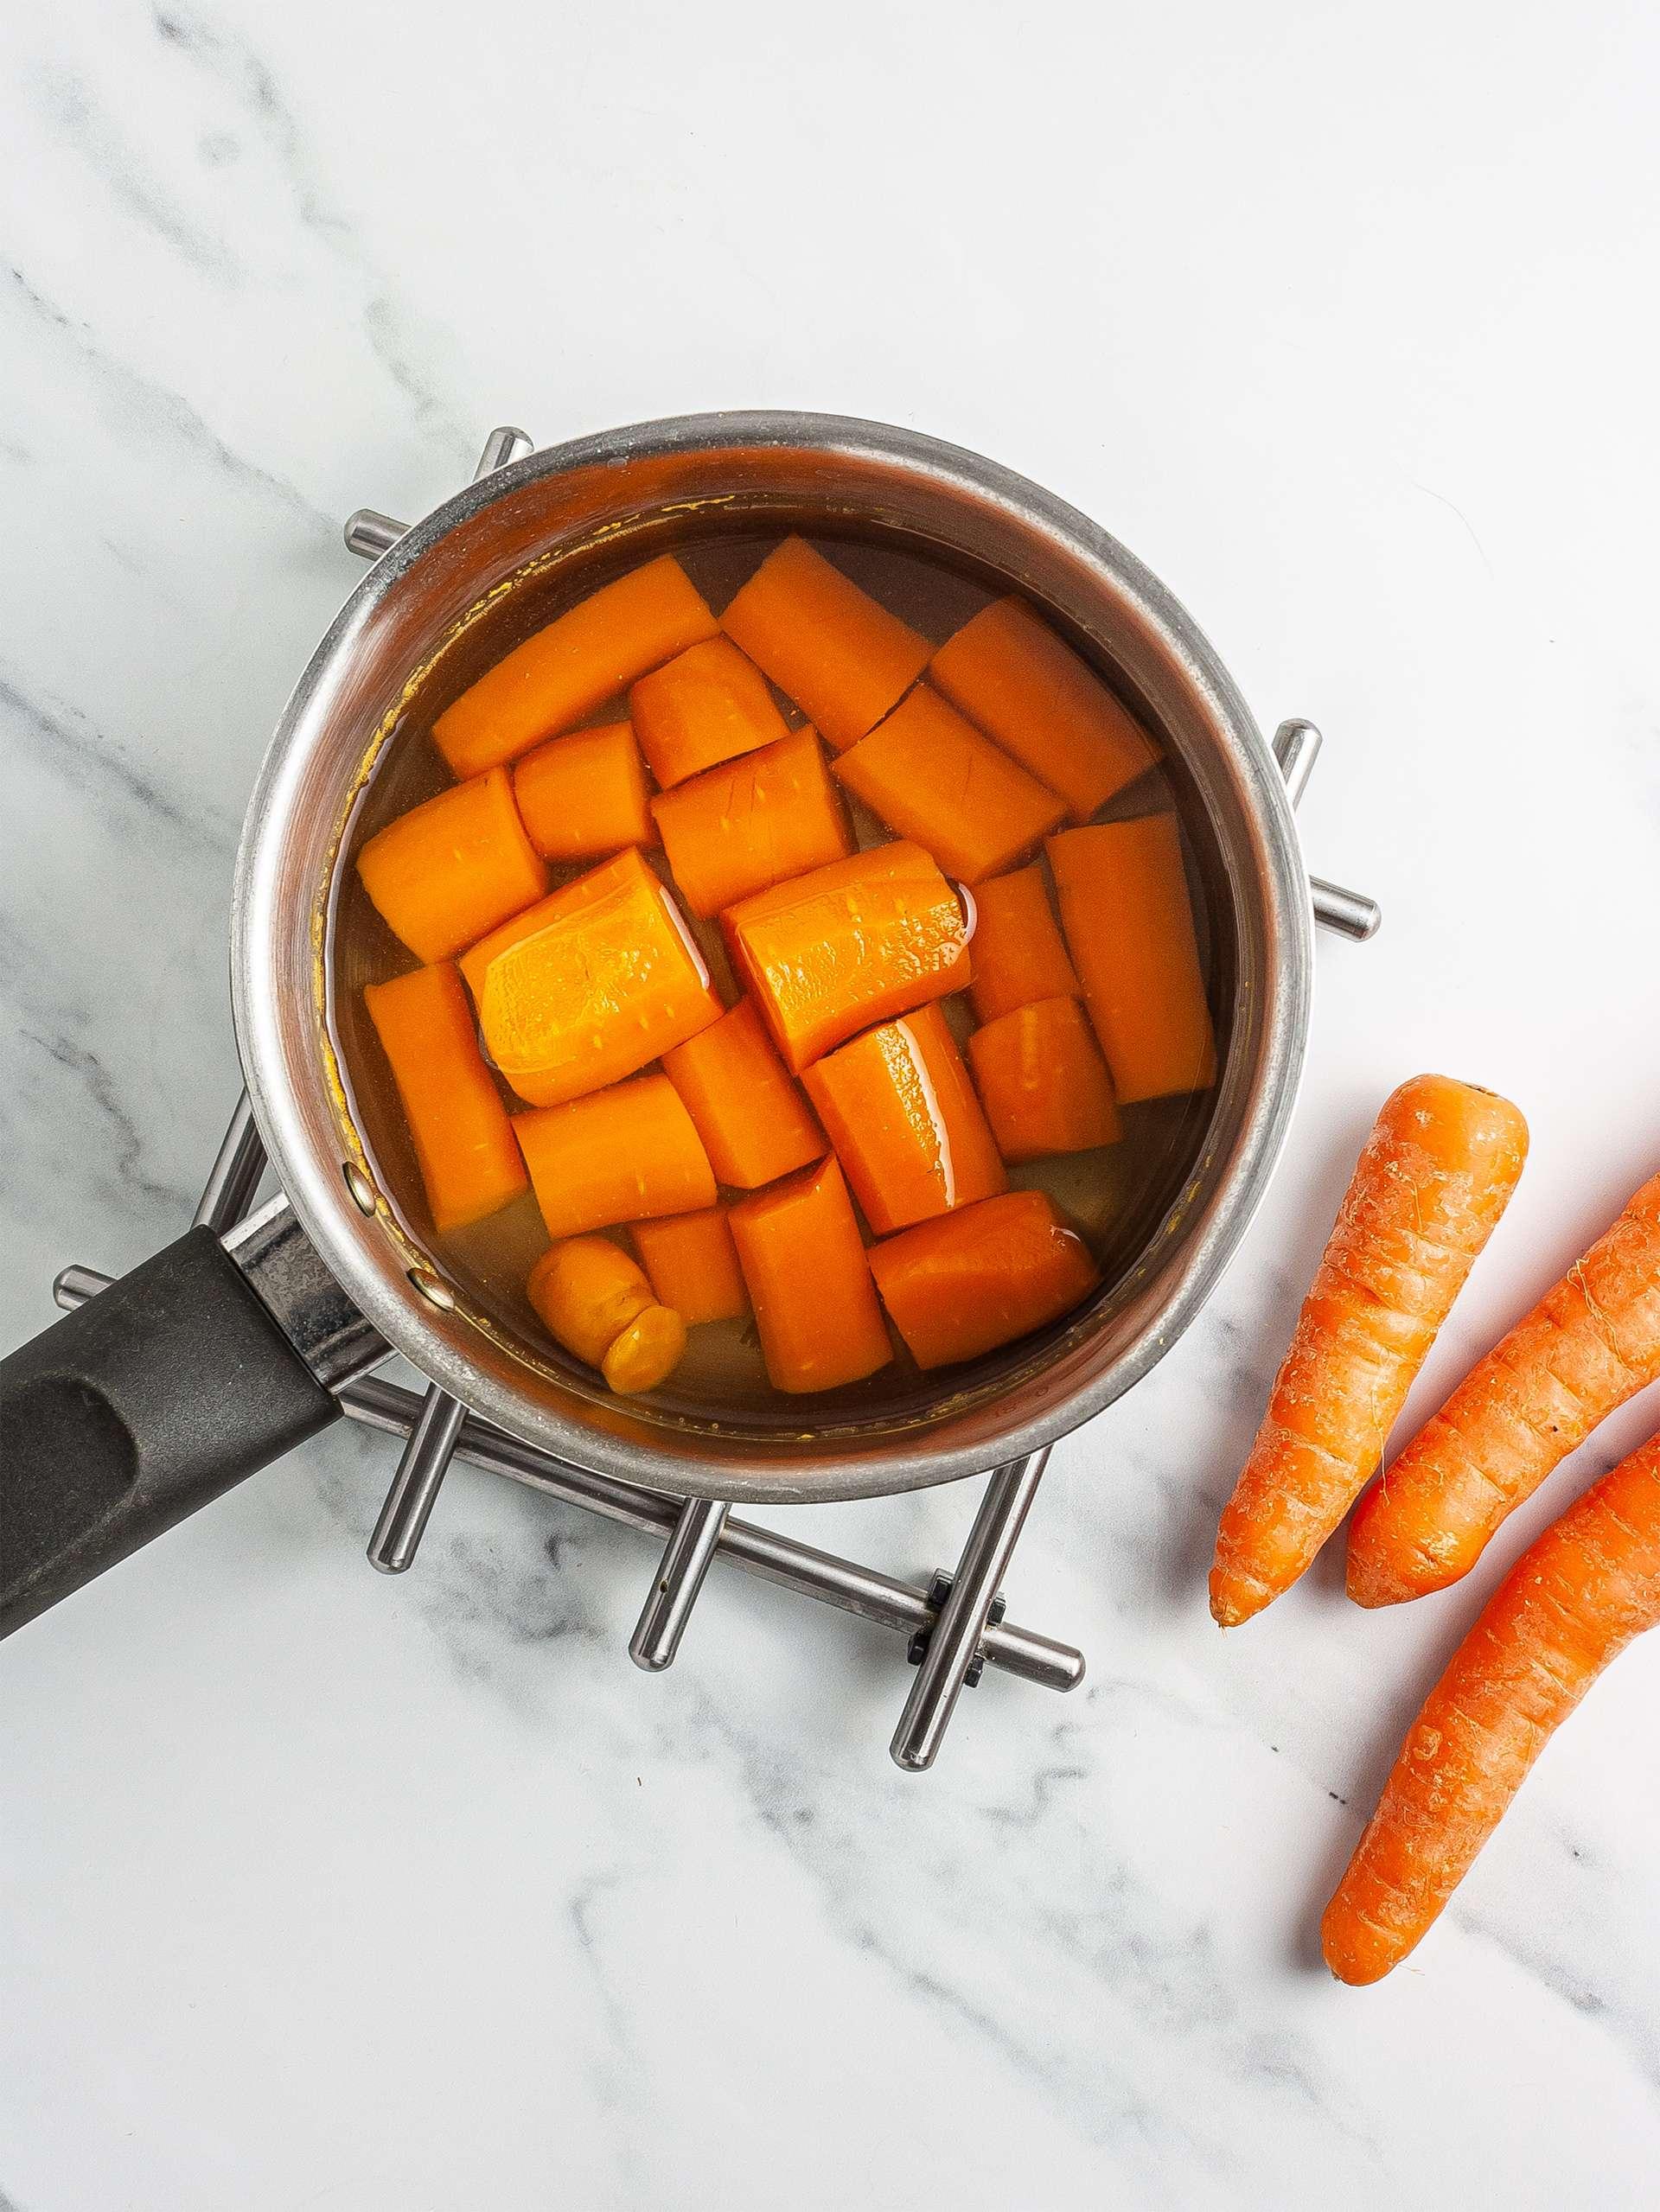 Boiled carrots